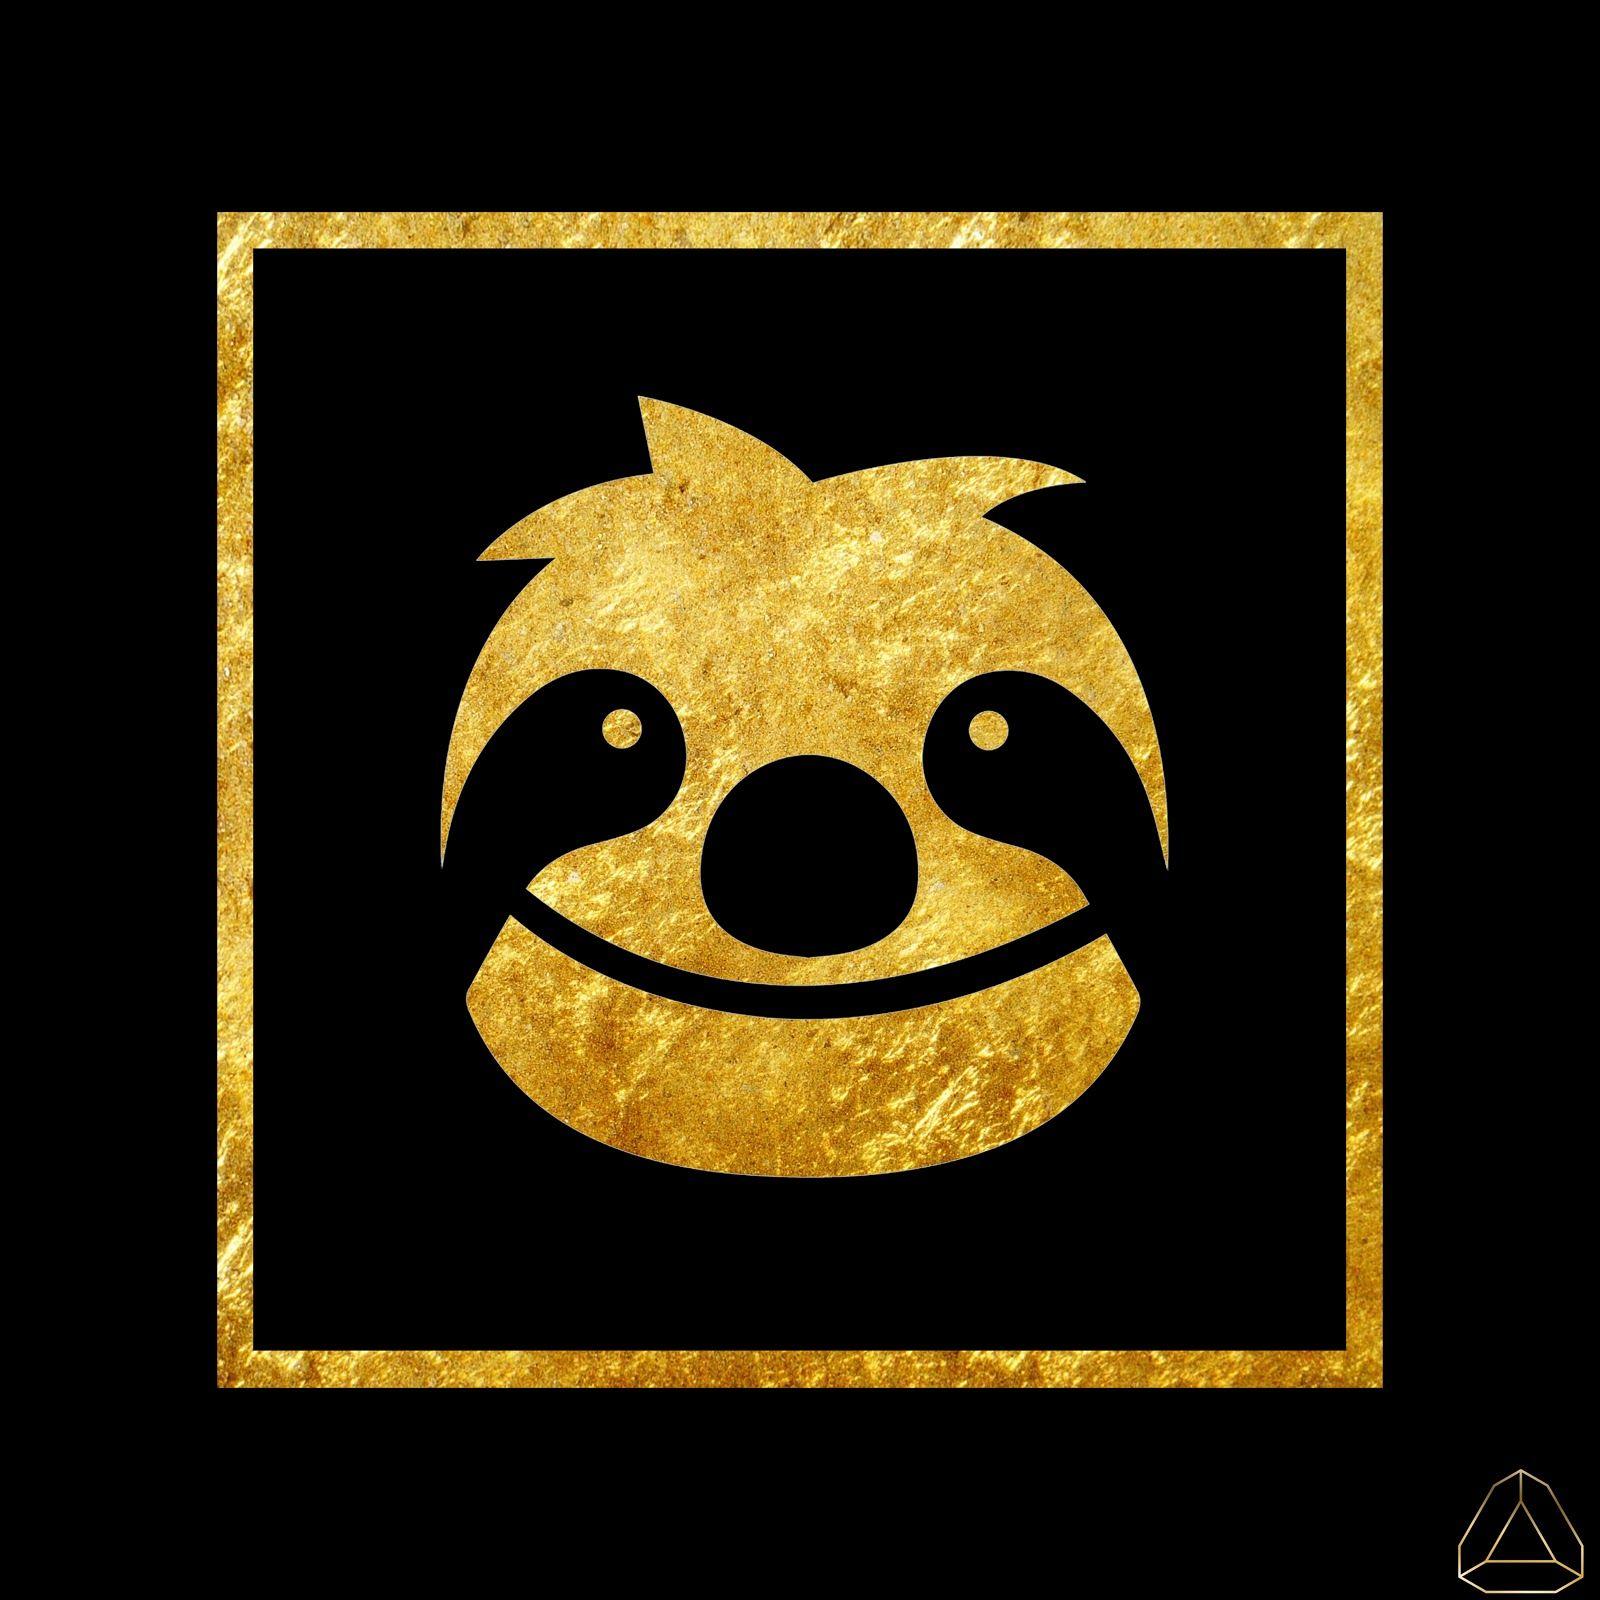 sacha-face-gold-box-5000x.jpg